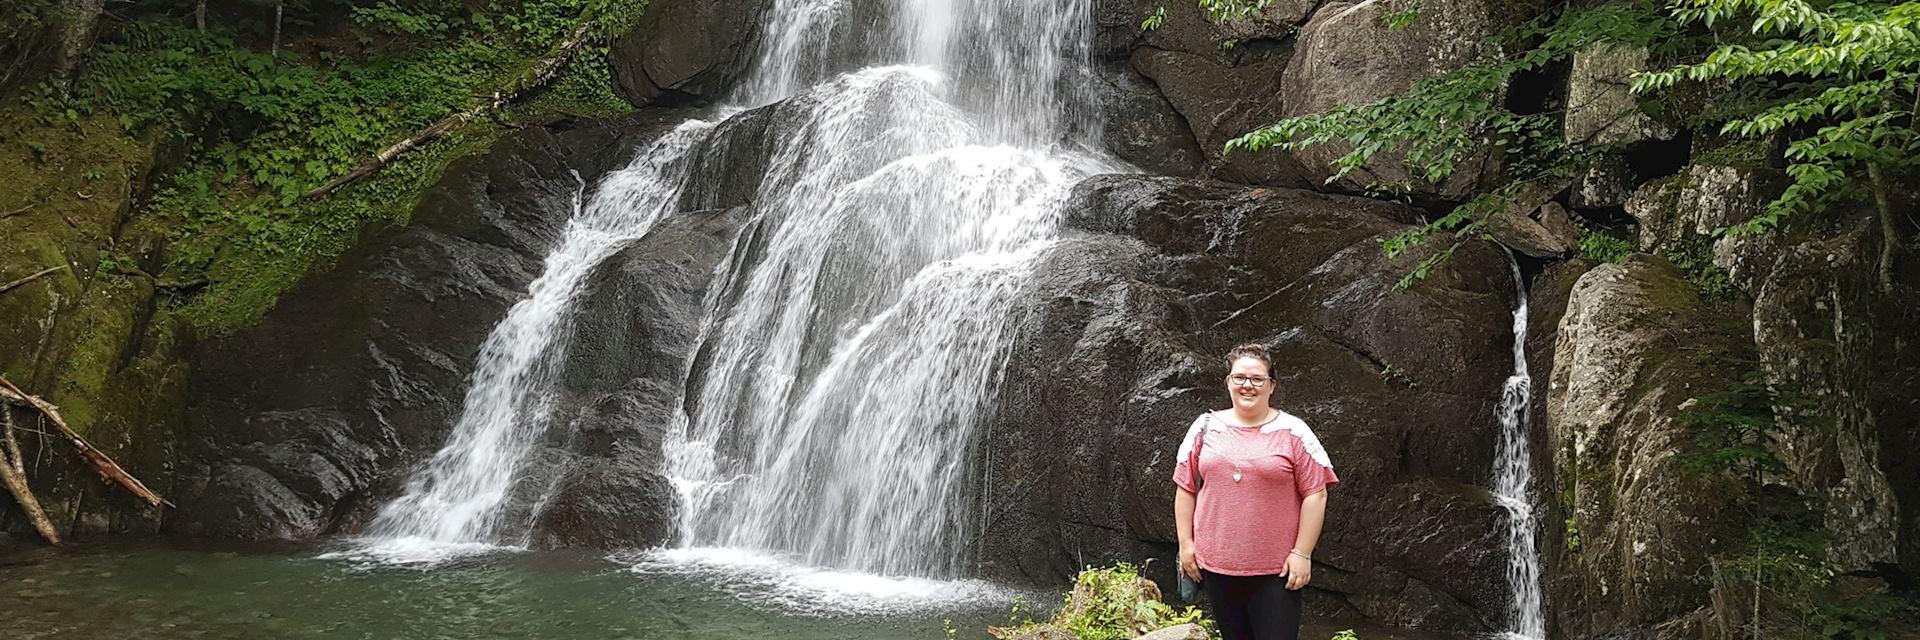 Natalie at Moss Glen Falls, near Granville, Vermont